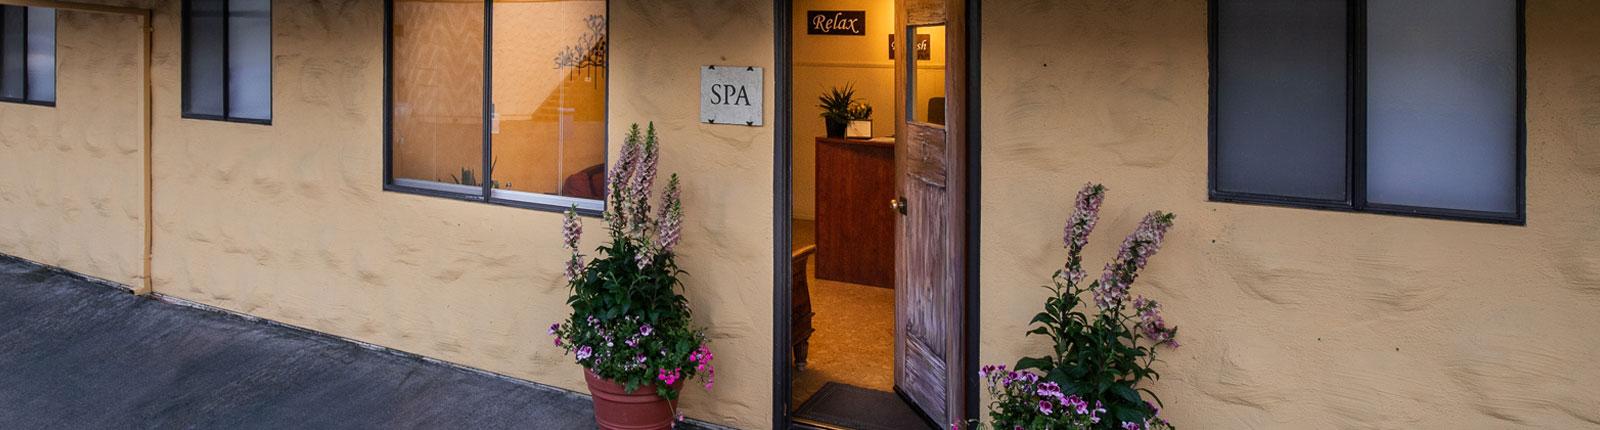 Contact at Resort Calistoga